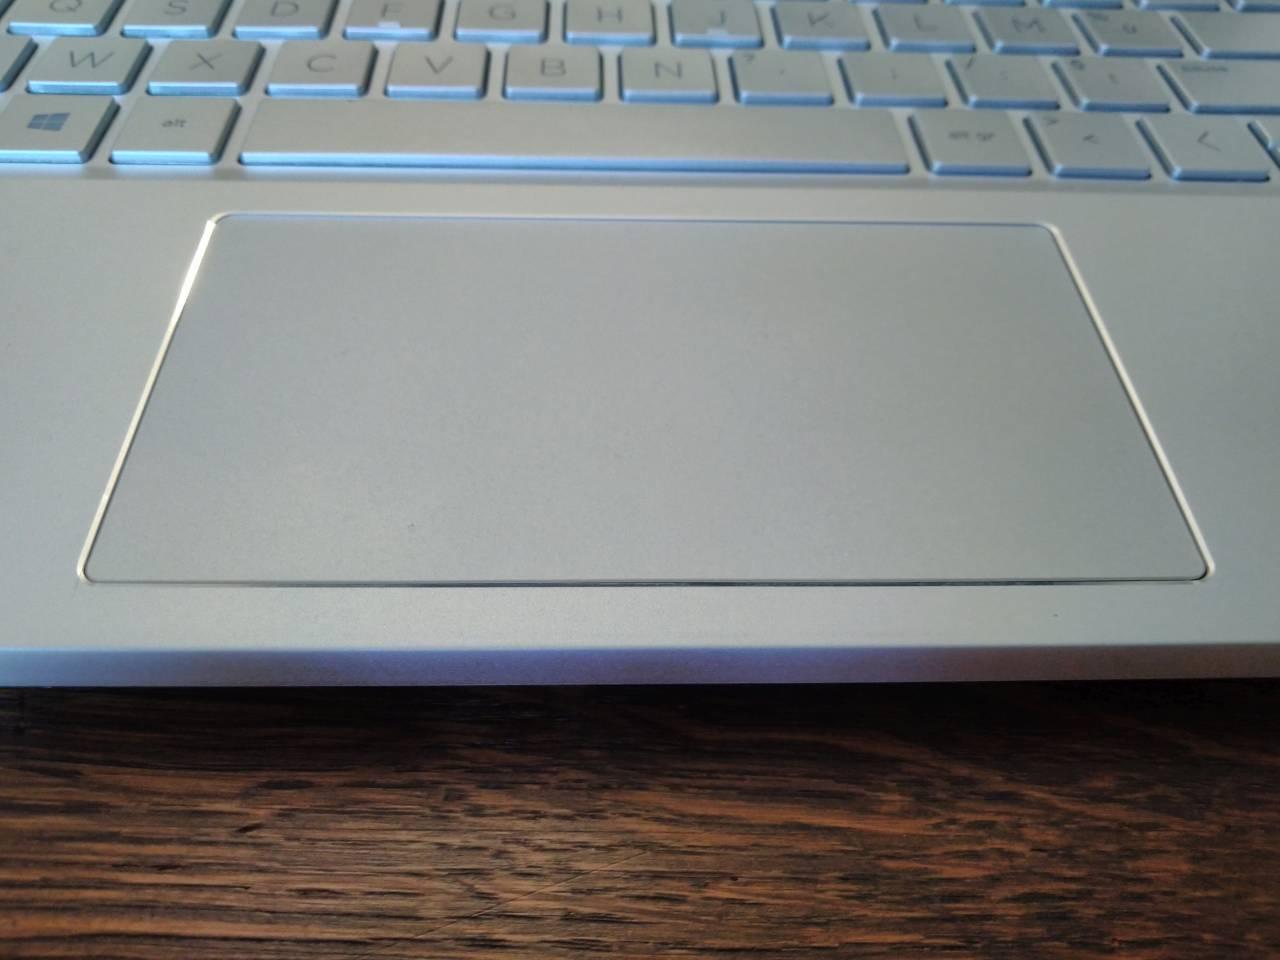 HP Pavilion 15-le trackpad